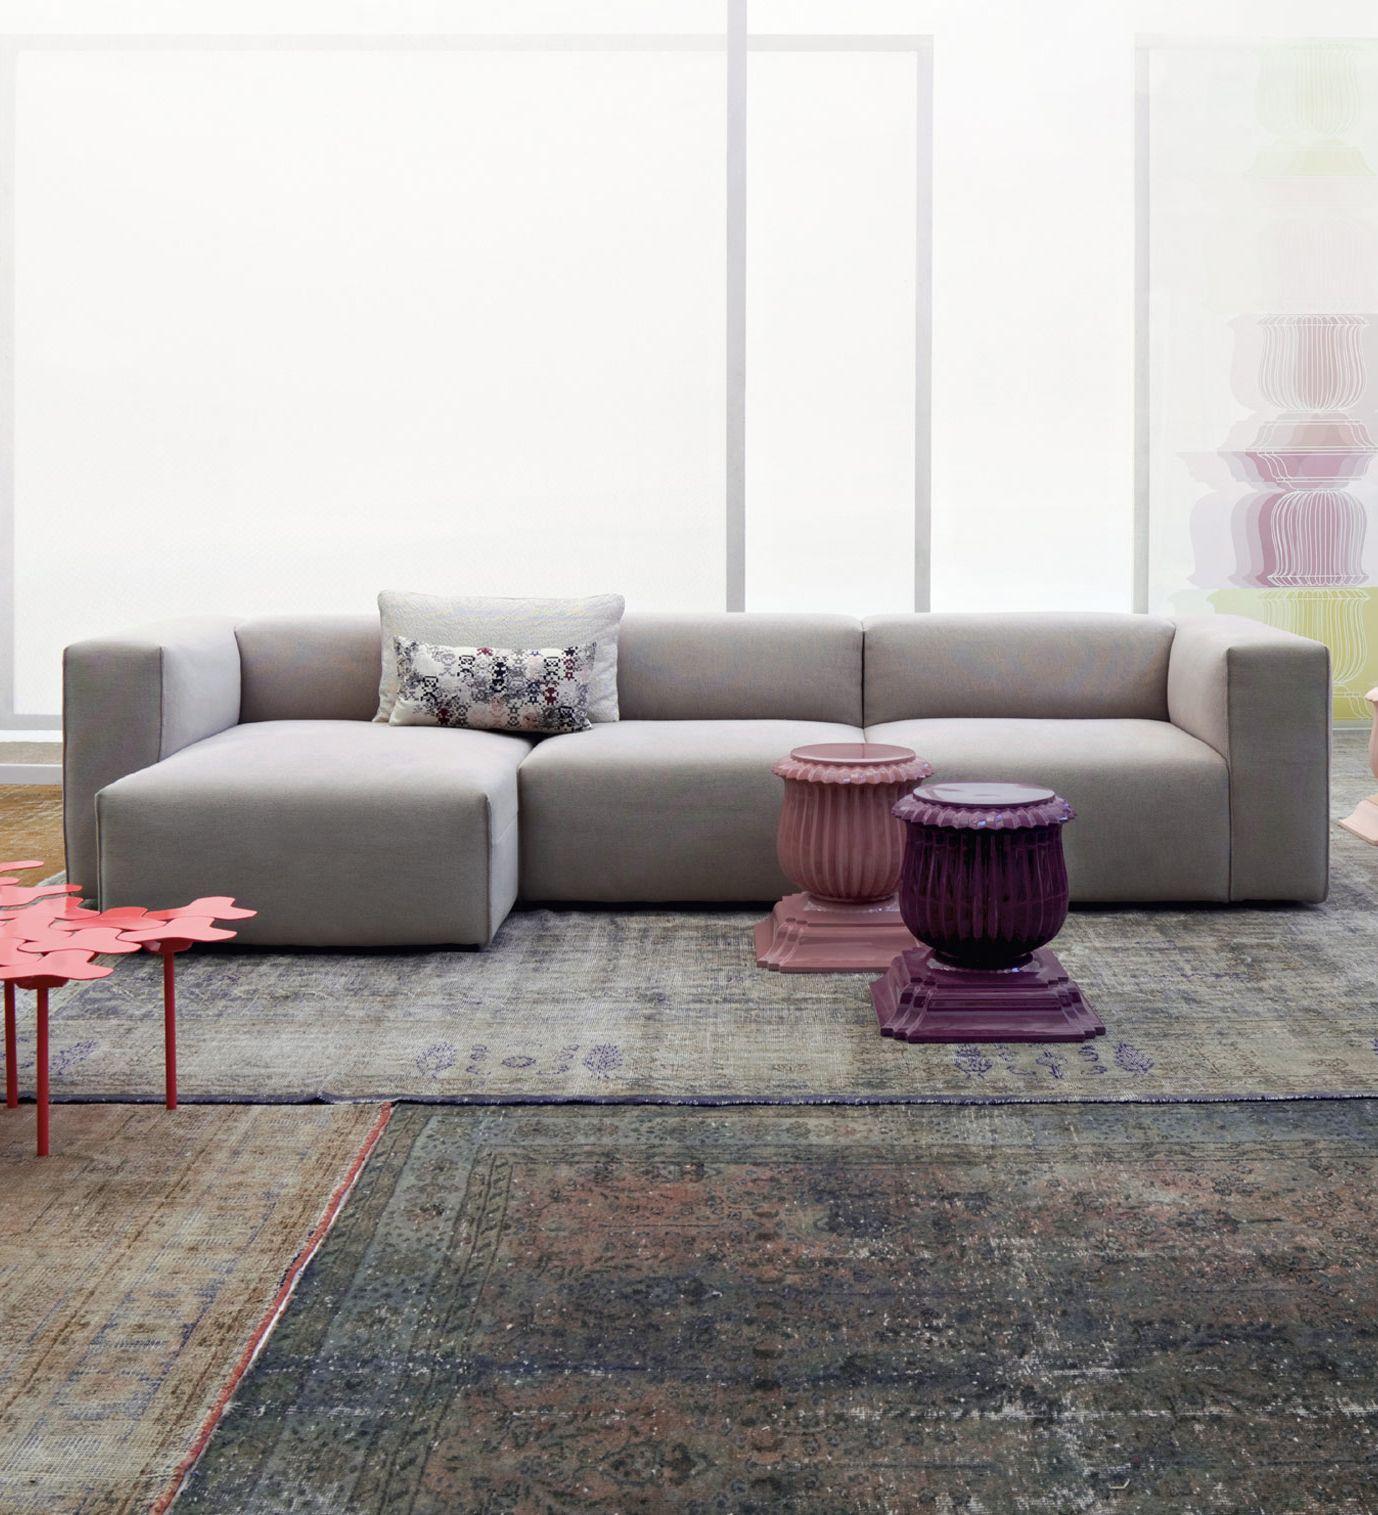 Spring Sofa Moroso Sofa Design Mobeldesign Modernes Sofa